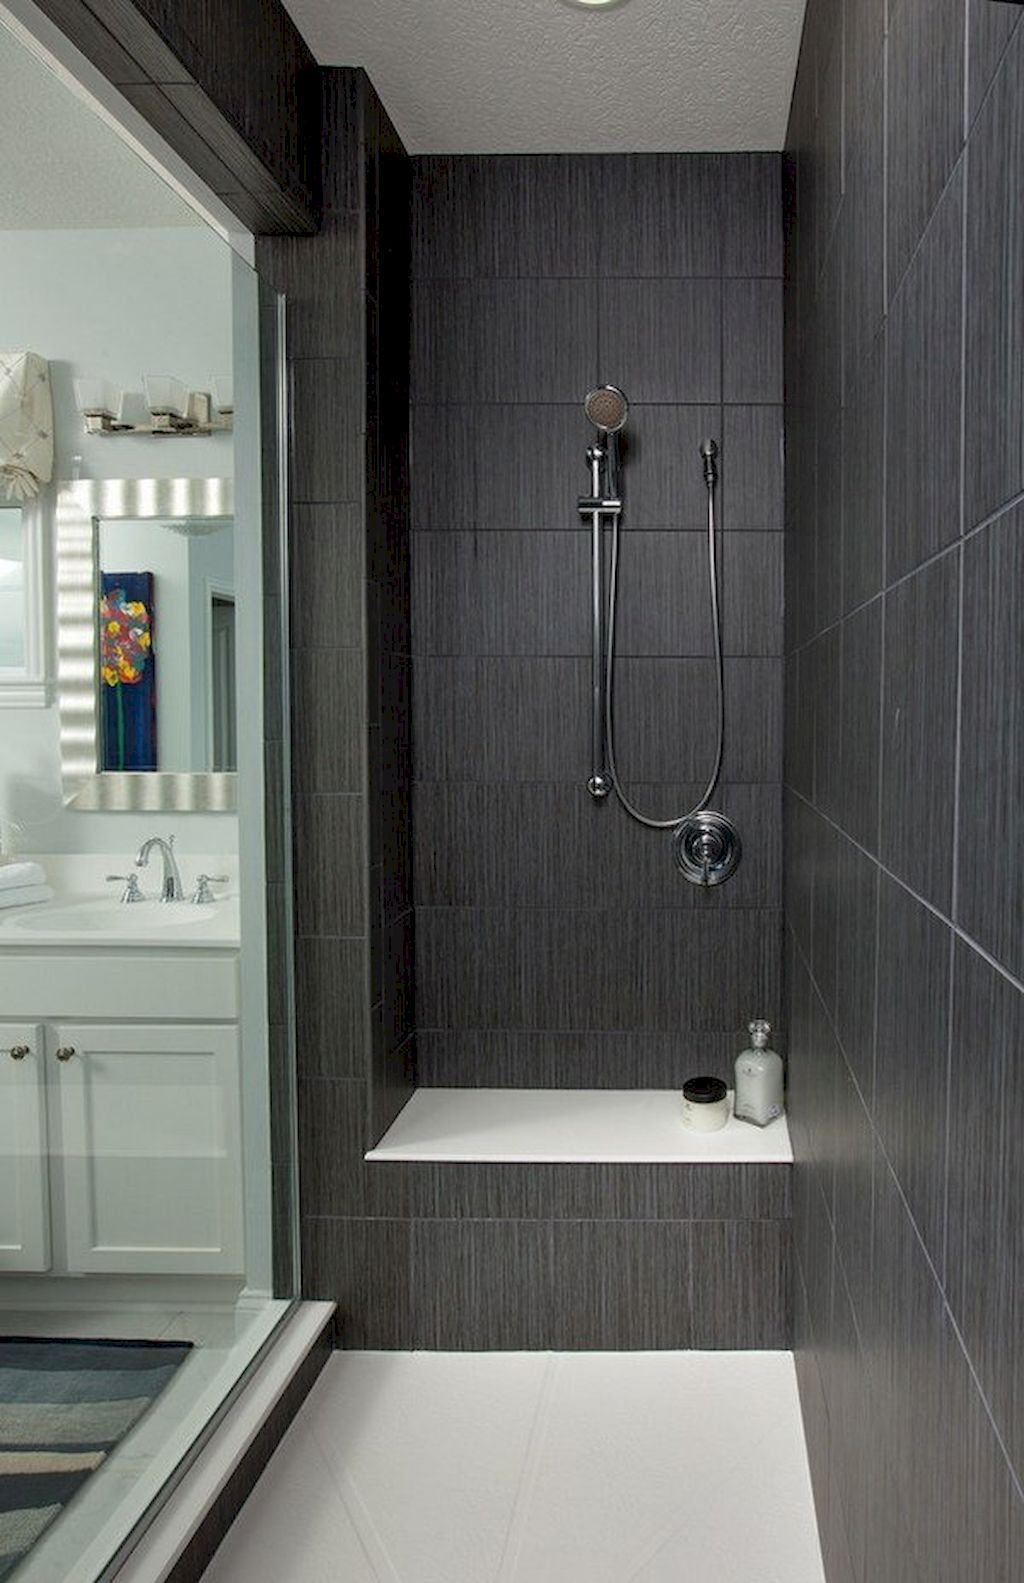 120 Stunning Bathroom Tile Shower Ideas Bathroomtileshowers With Images Dark Tile Shower Bathroom Shower Tile Large Shower Tile